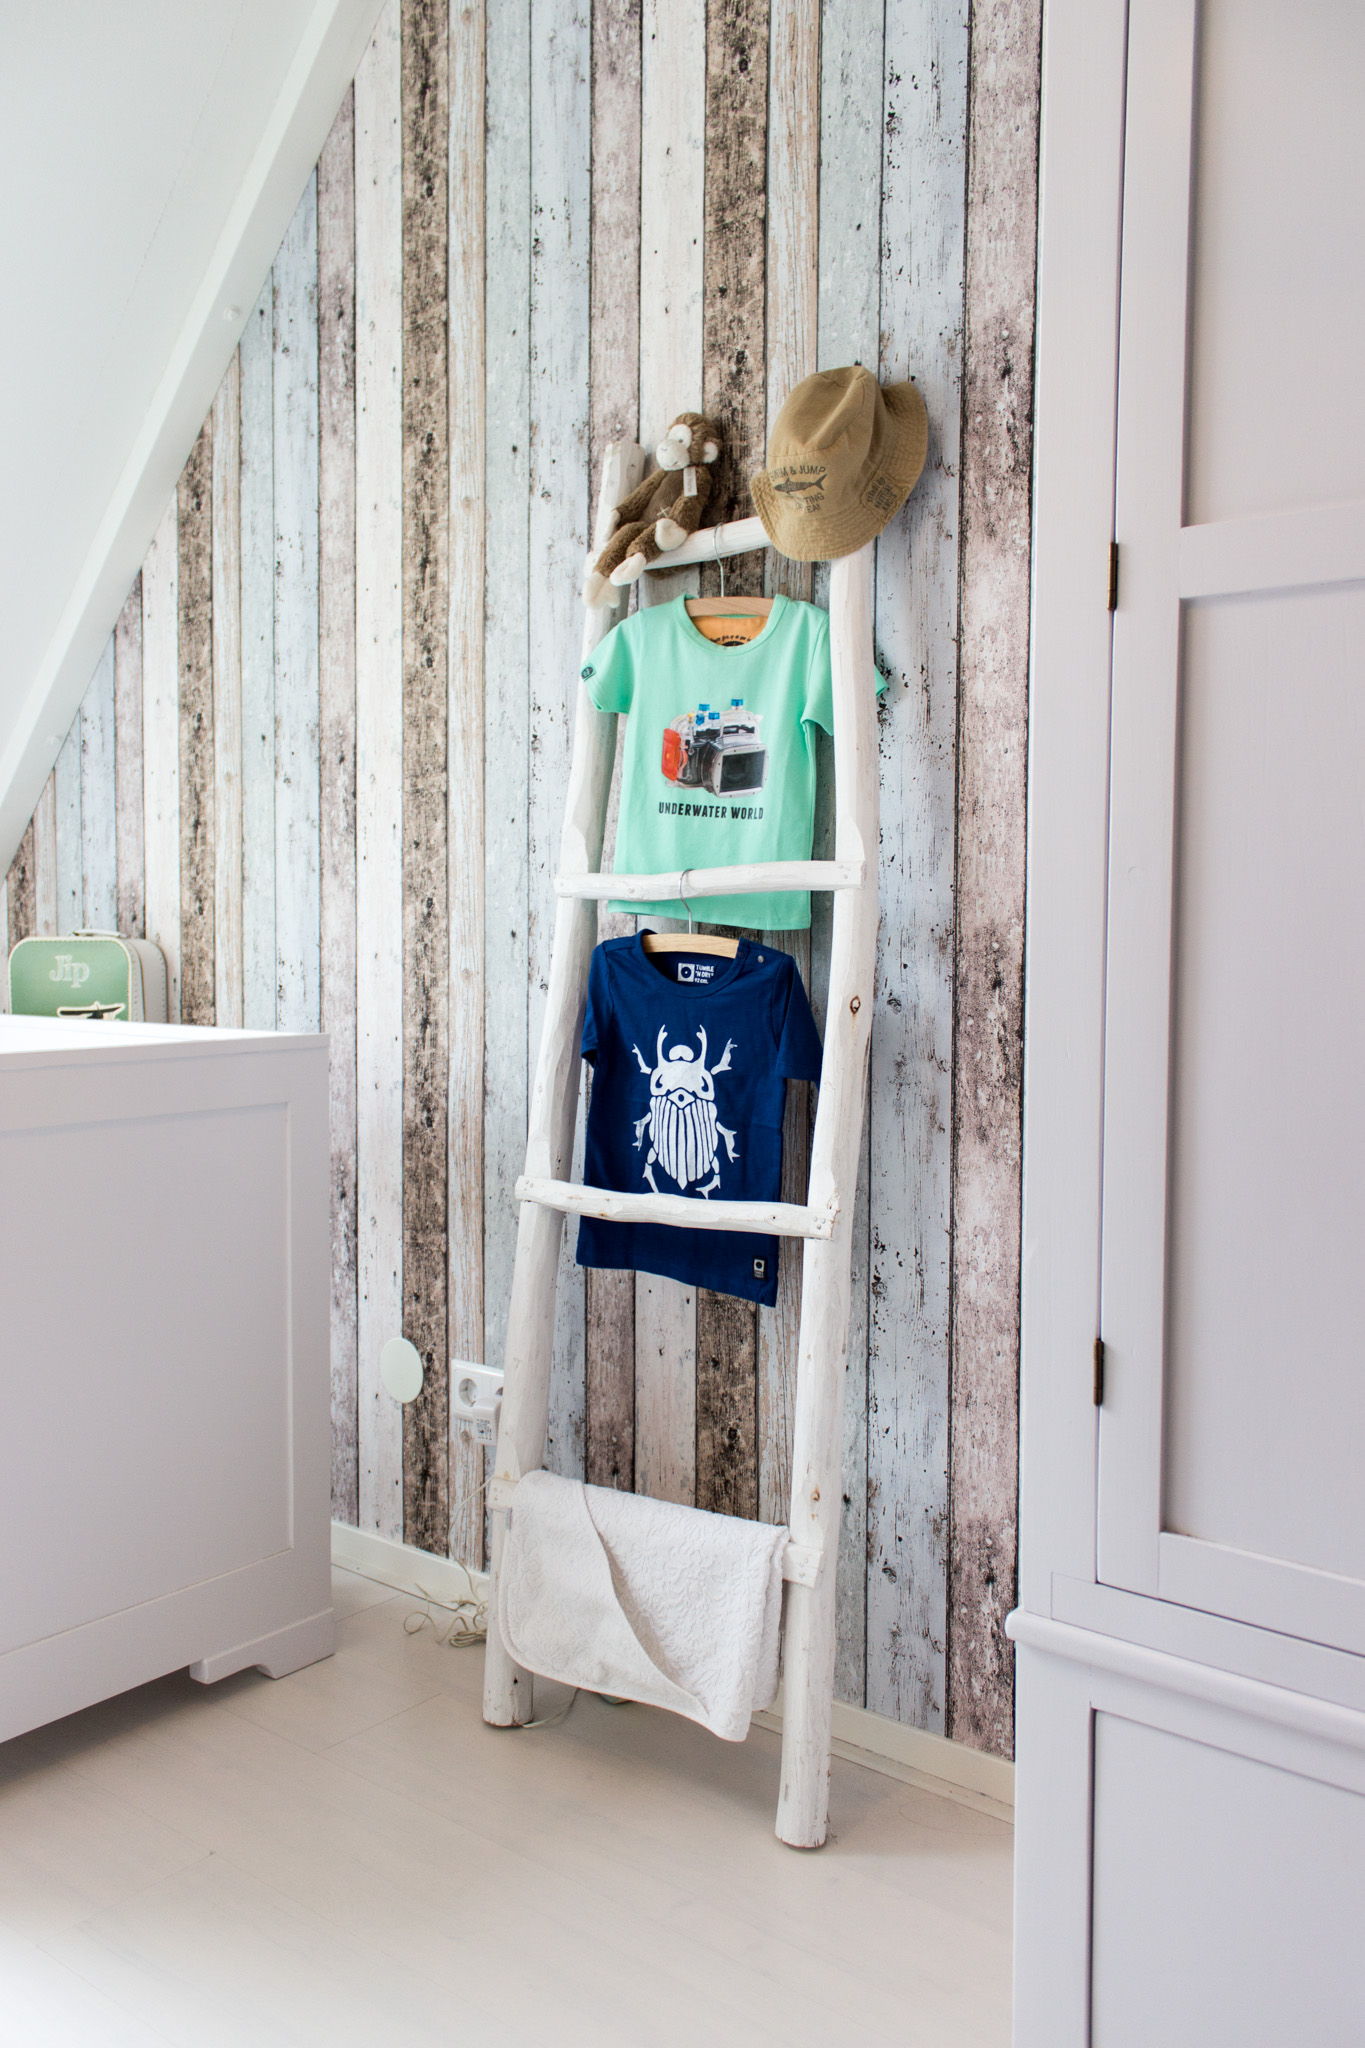 Baby ontwerp sterren kamer - Kamer kindontwerp ...